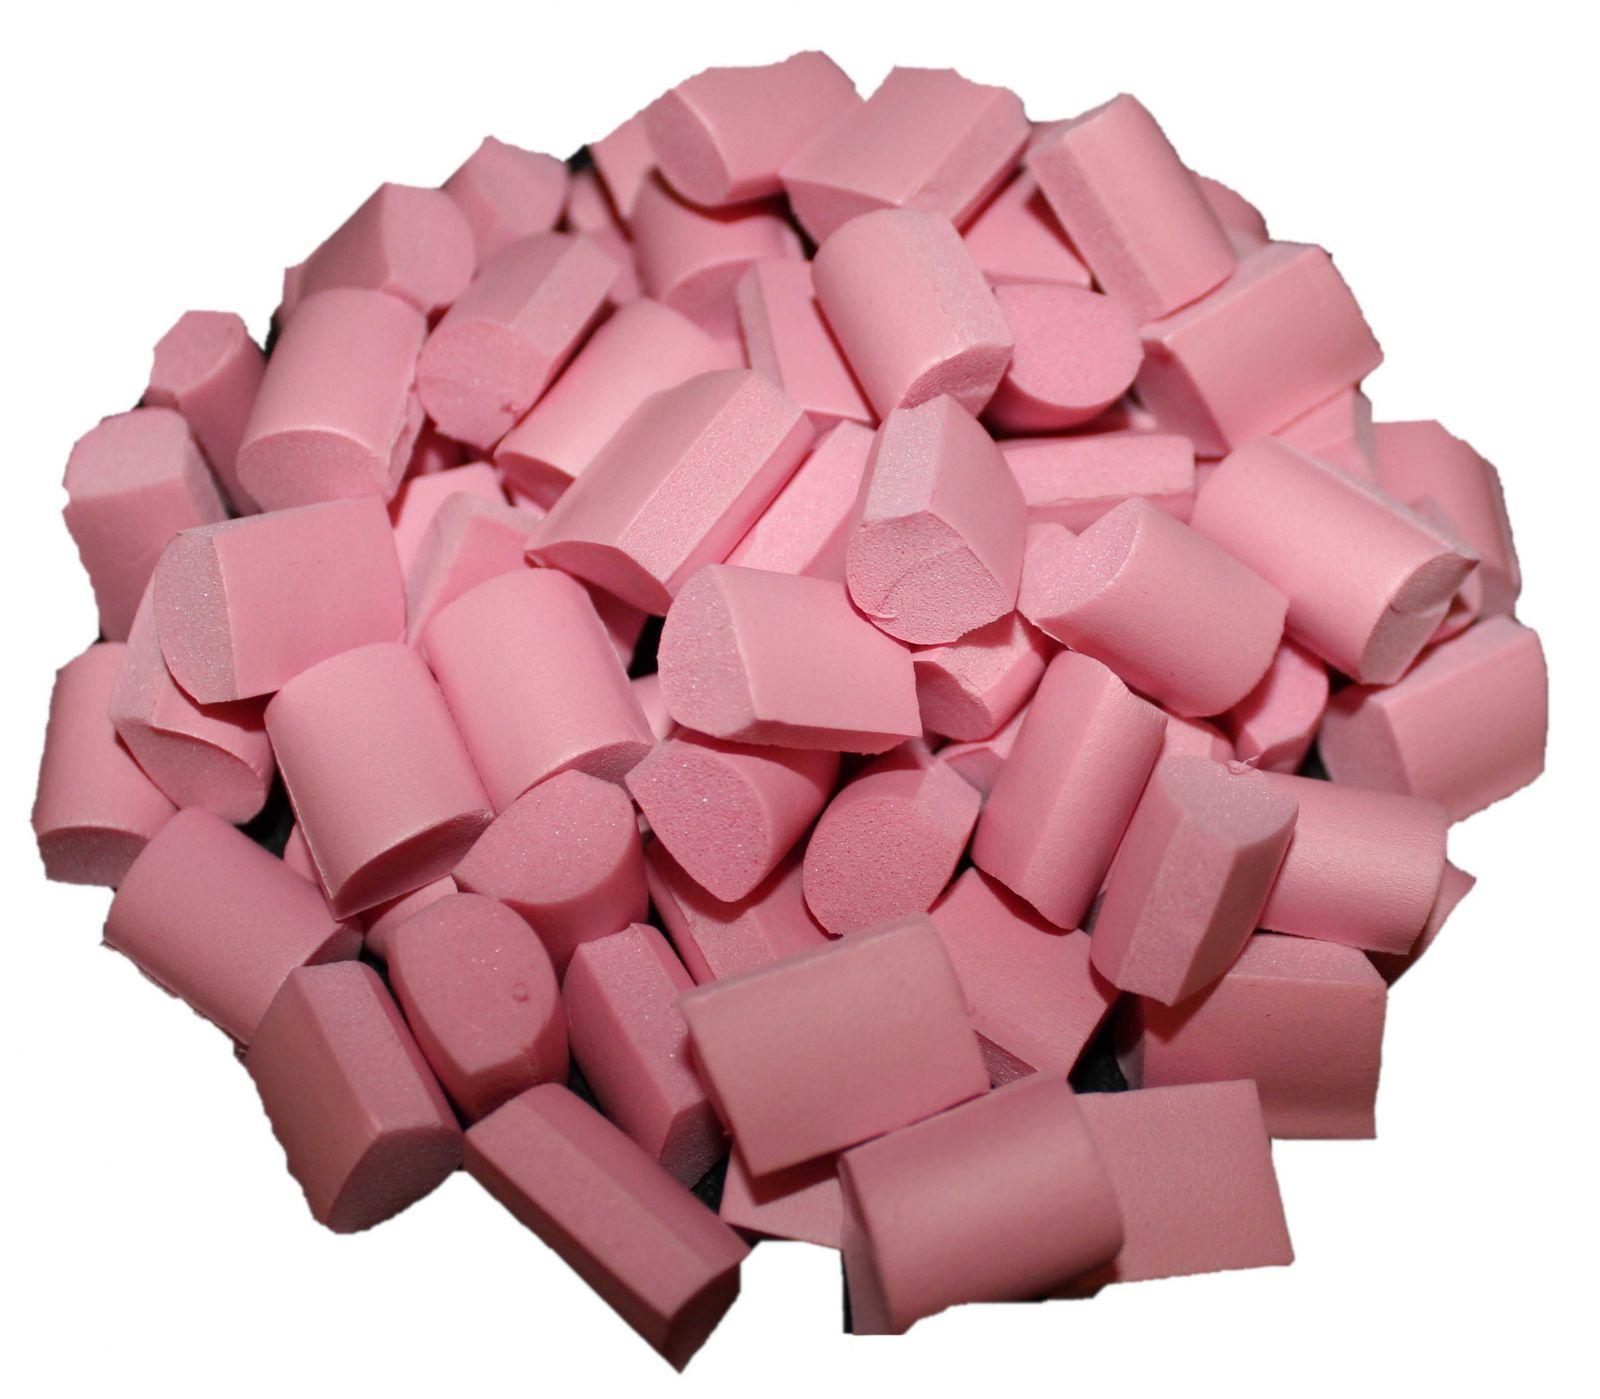 Foam chunks do slizu pěnové kousky do slizu foam chunks na vyrábění slizu